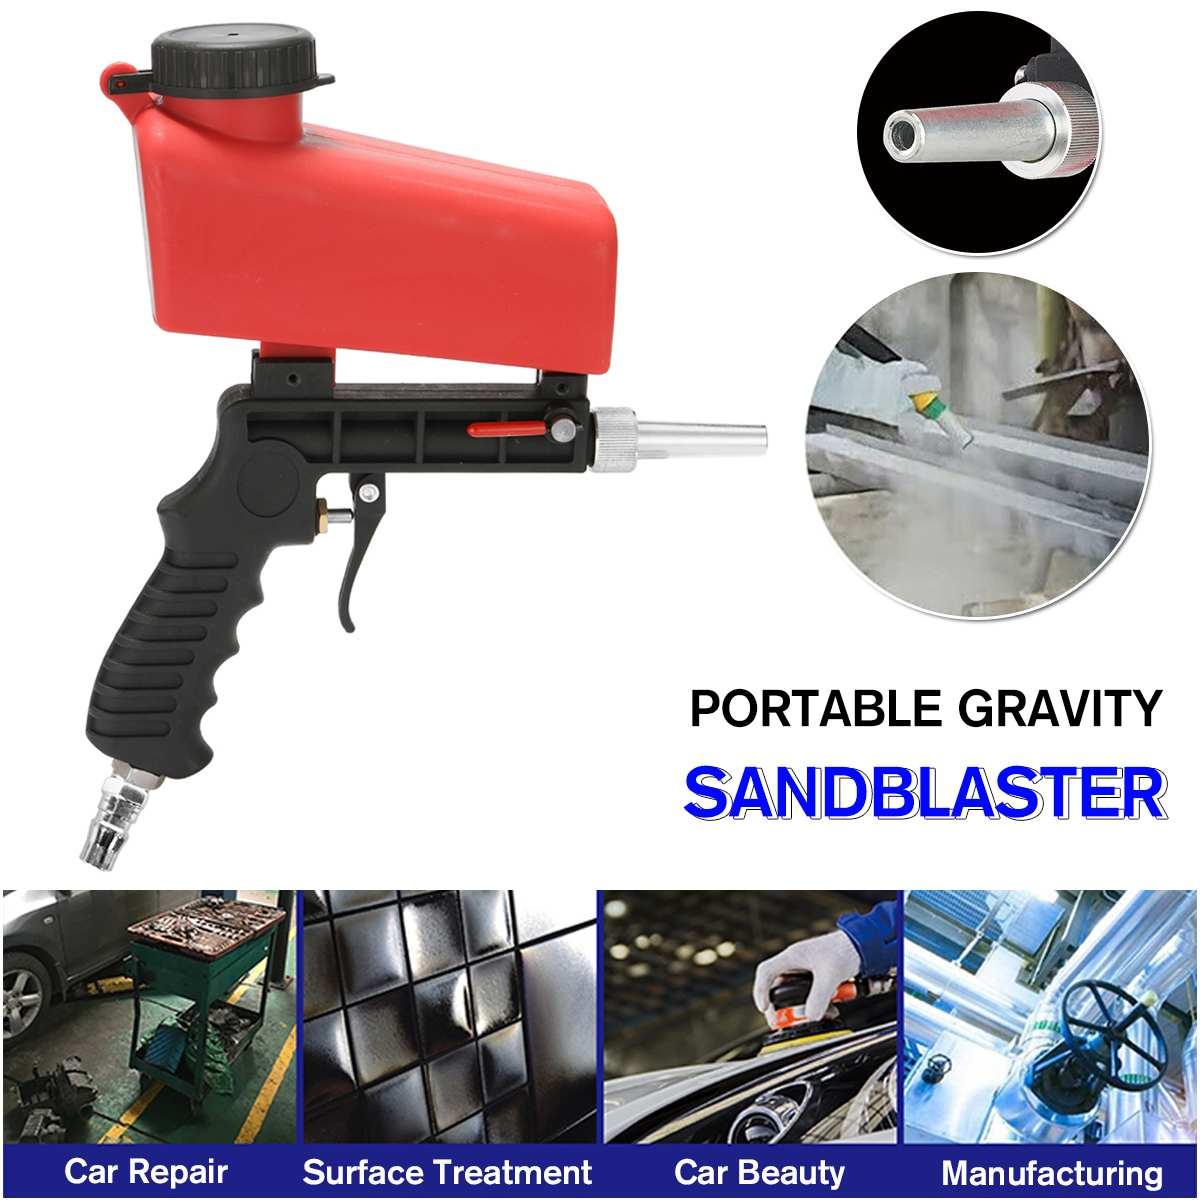 90psi Portable Gravity Sandblasting Guns Aluminium Pneumatic Sandblaster Spray Guns Sand Removal Blasting Power MachineSpray Guns   -